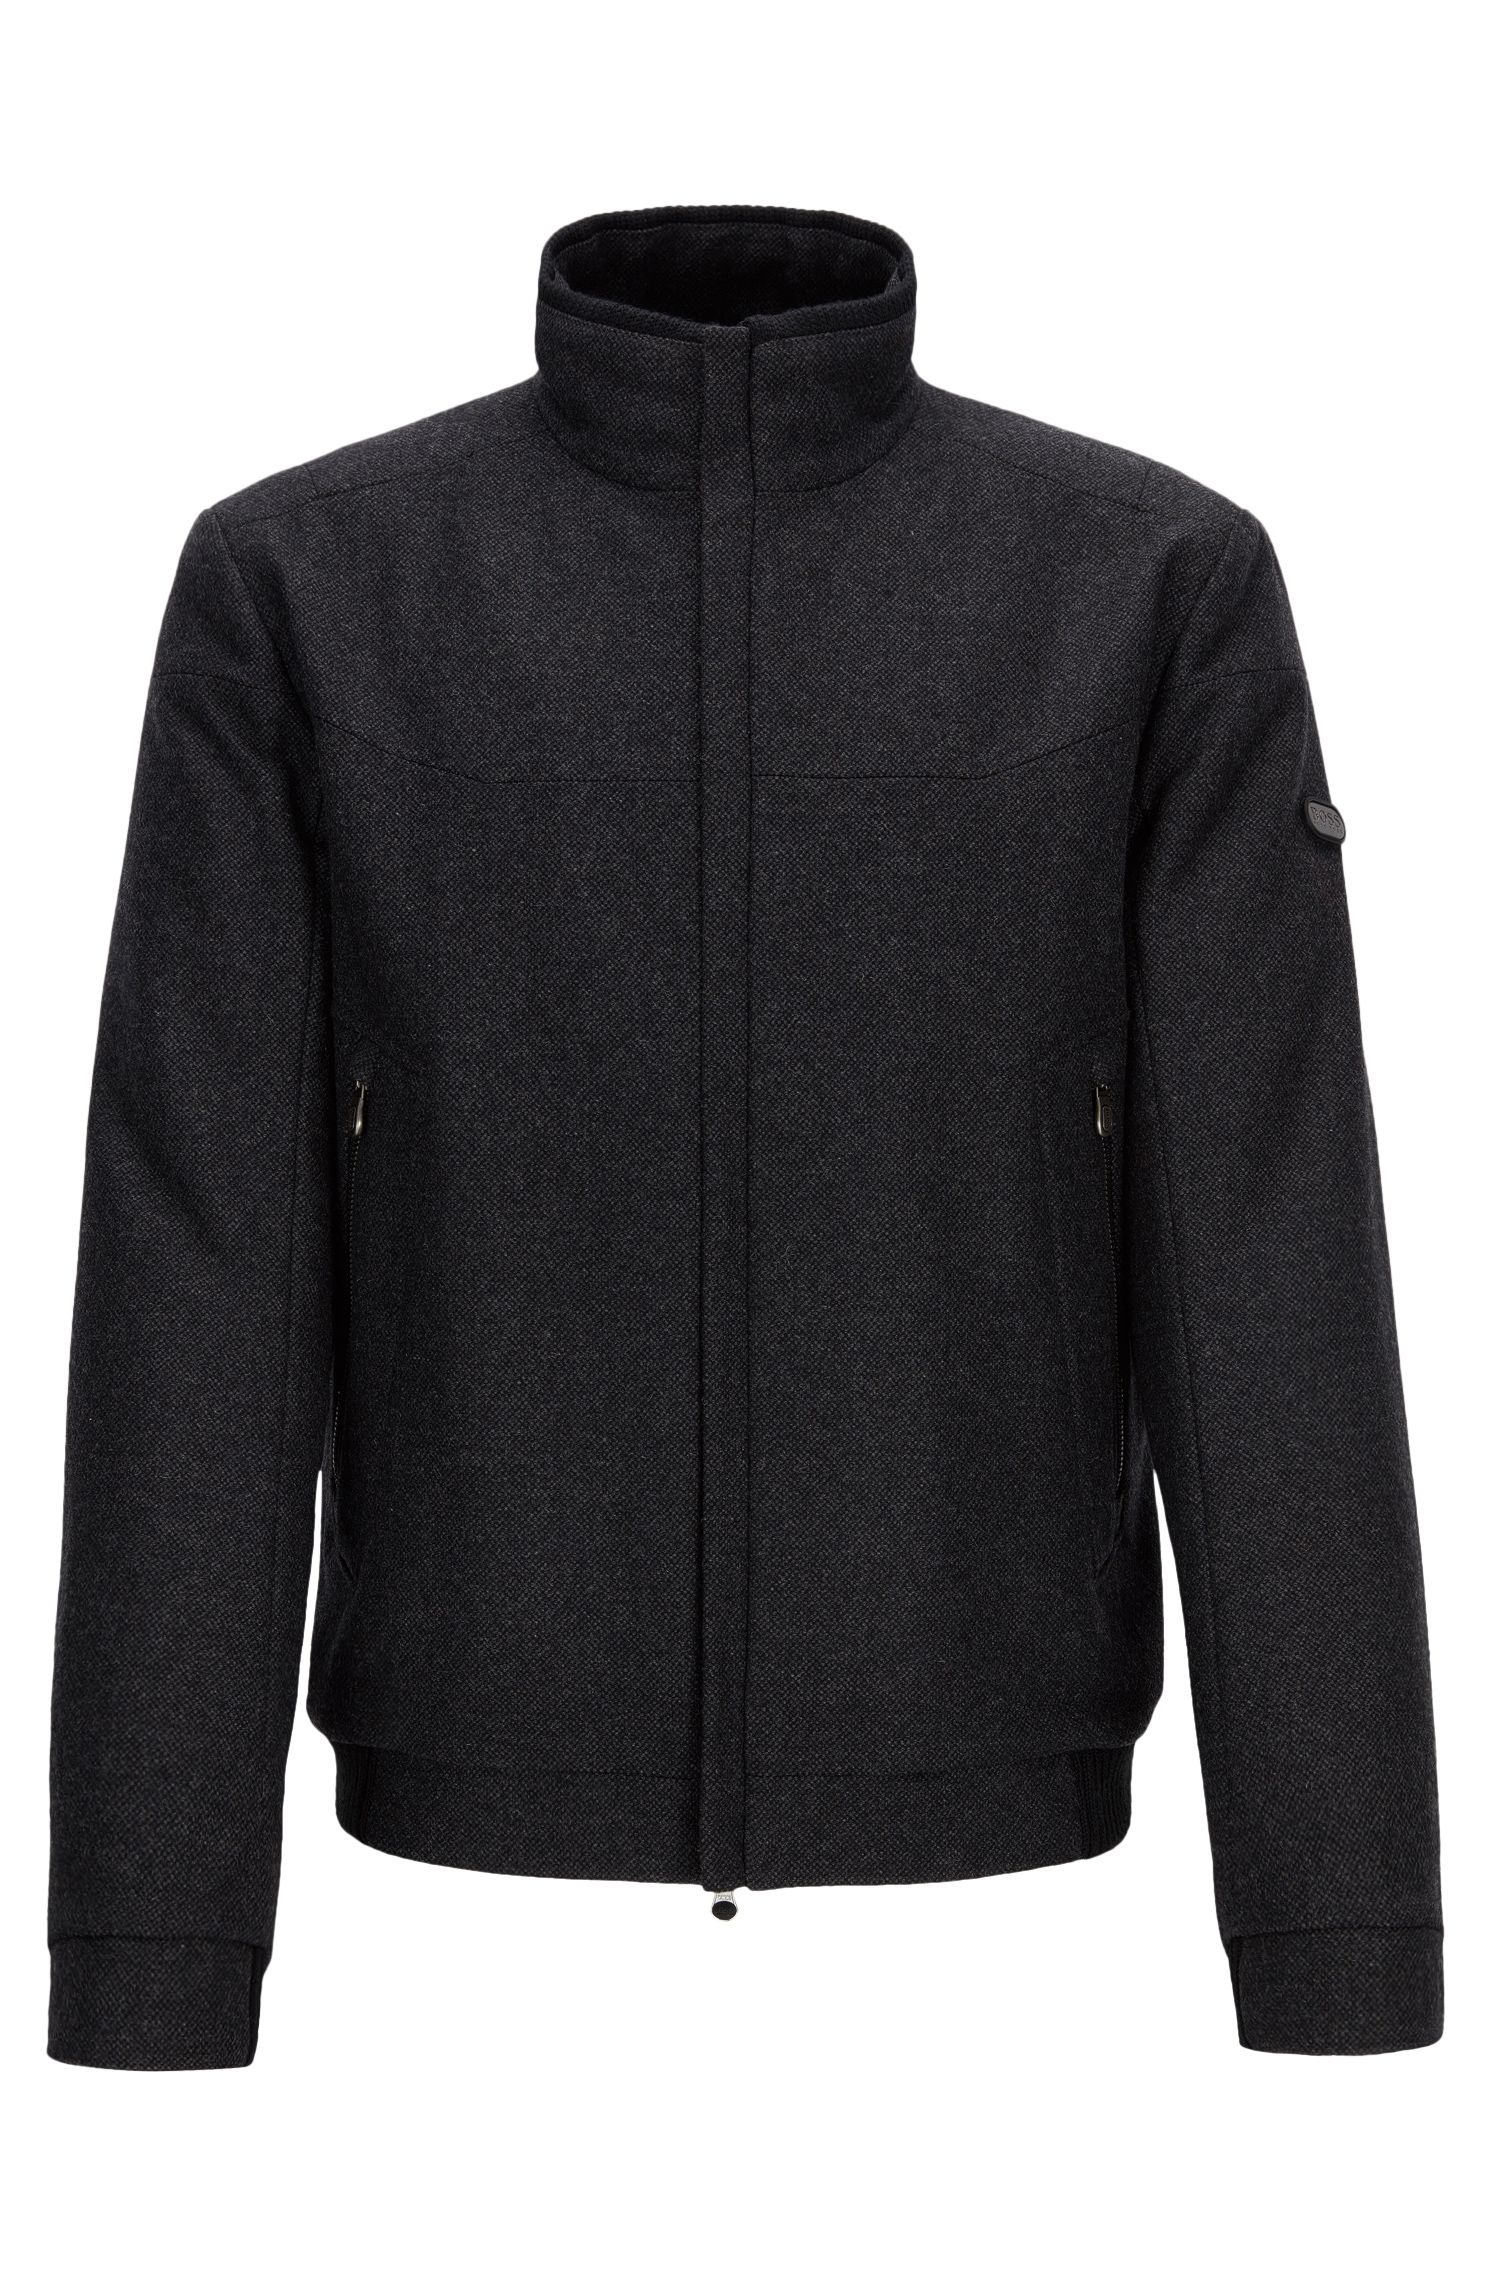 Regular-fit jacket in a wool blend